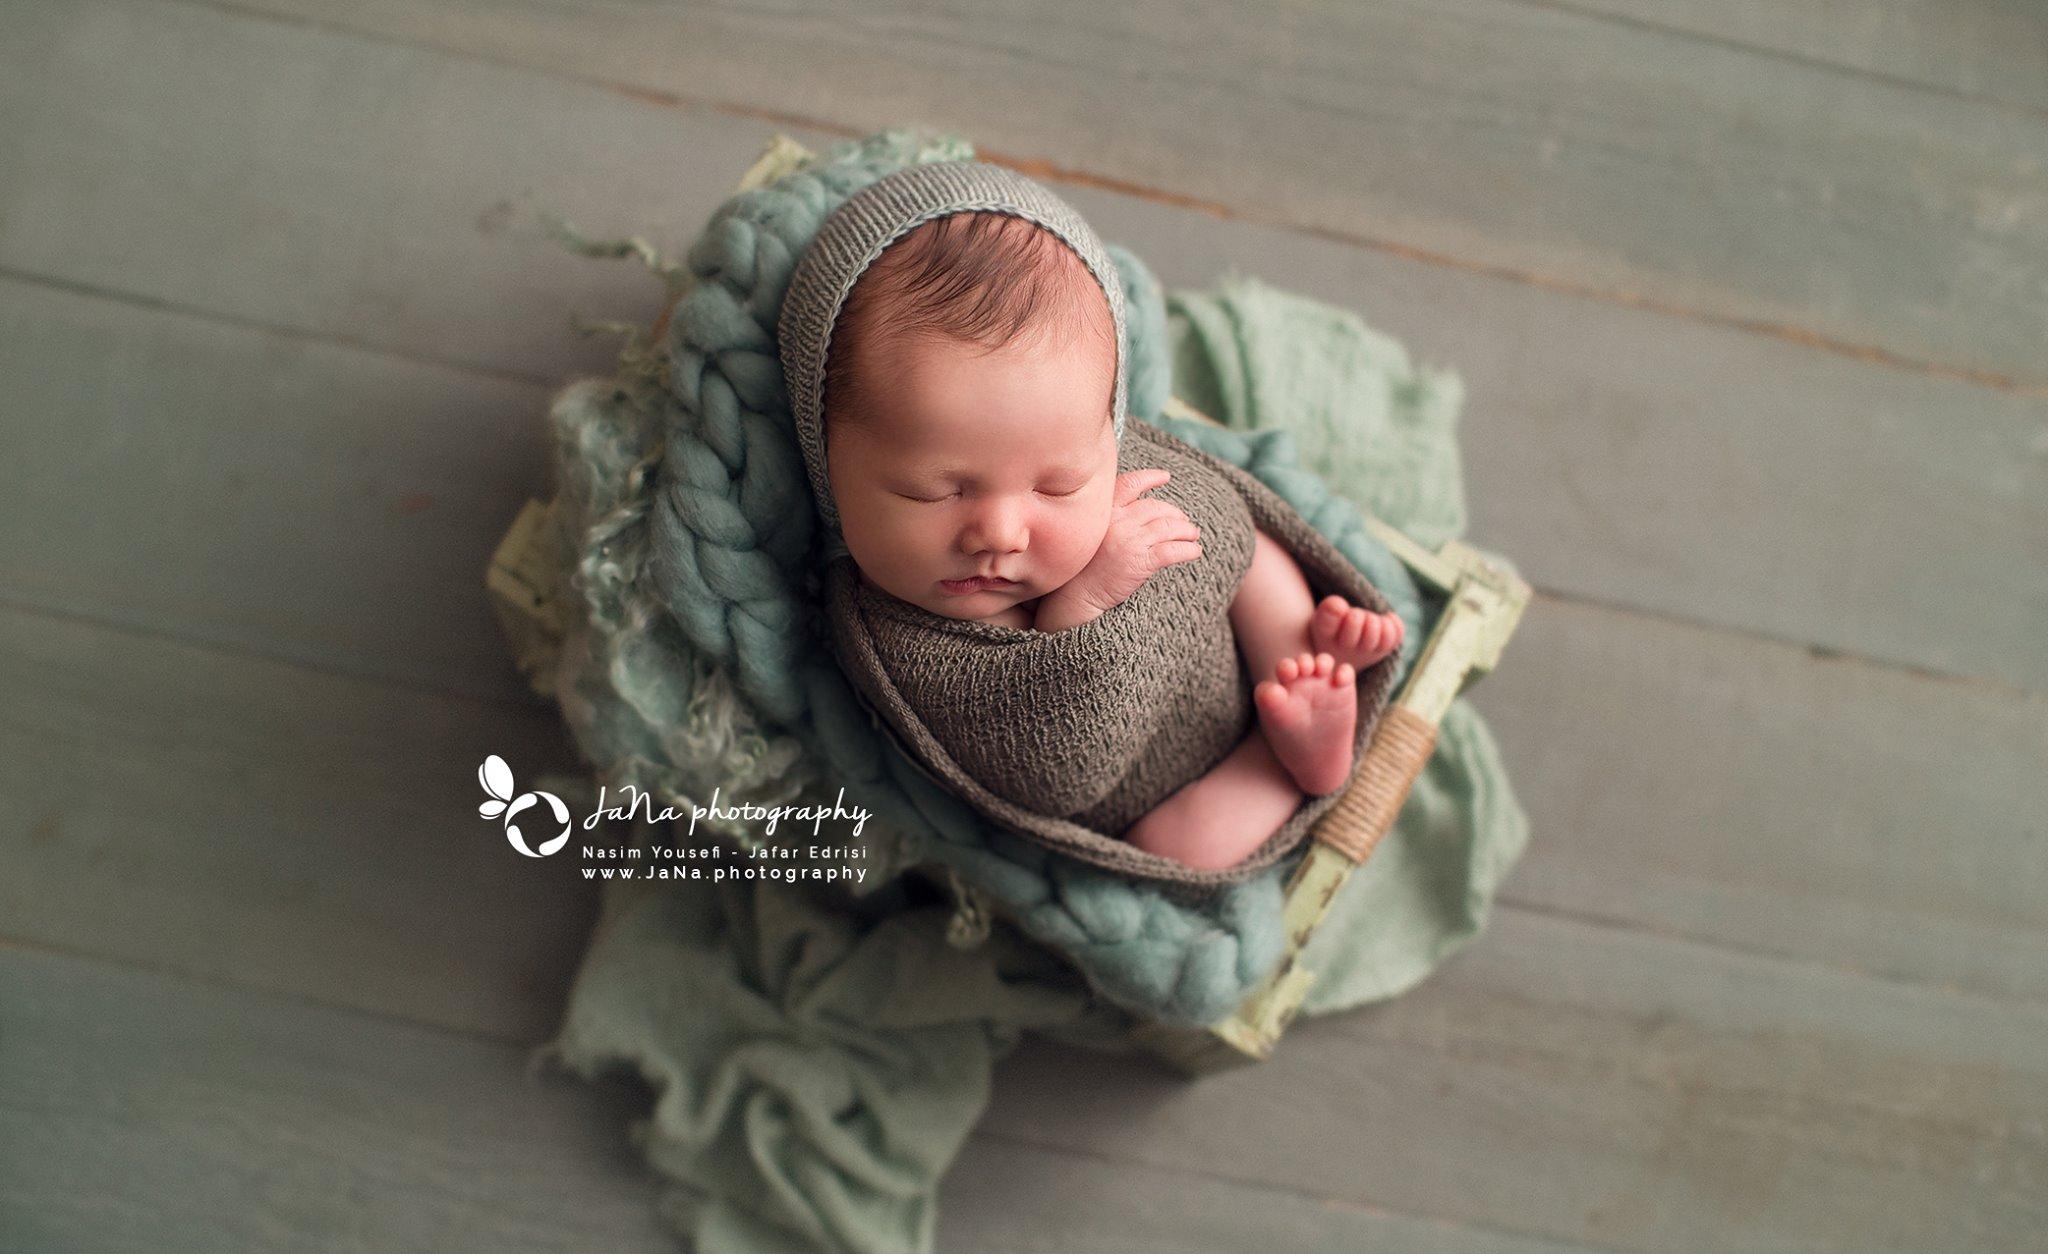 Newborn photography – Vancouver, Burnaby, Surrey